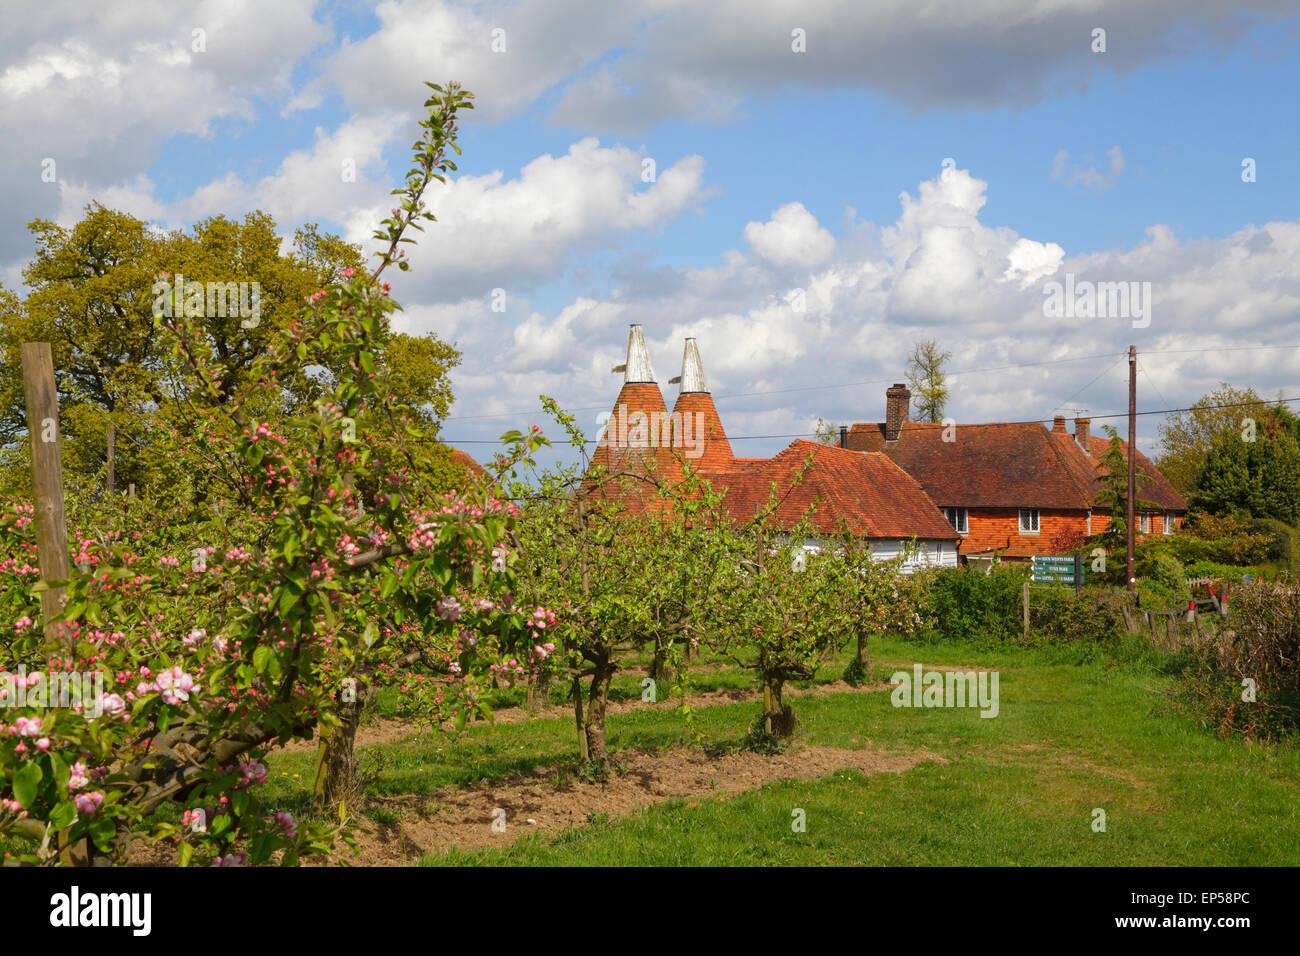 Maisons Oast et Apple Blossom Kent, Royaume-Uni, Angleterre, Grande-Bretagne, GO Photo Stock